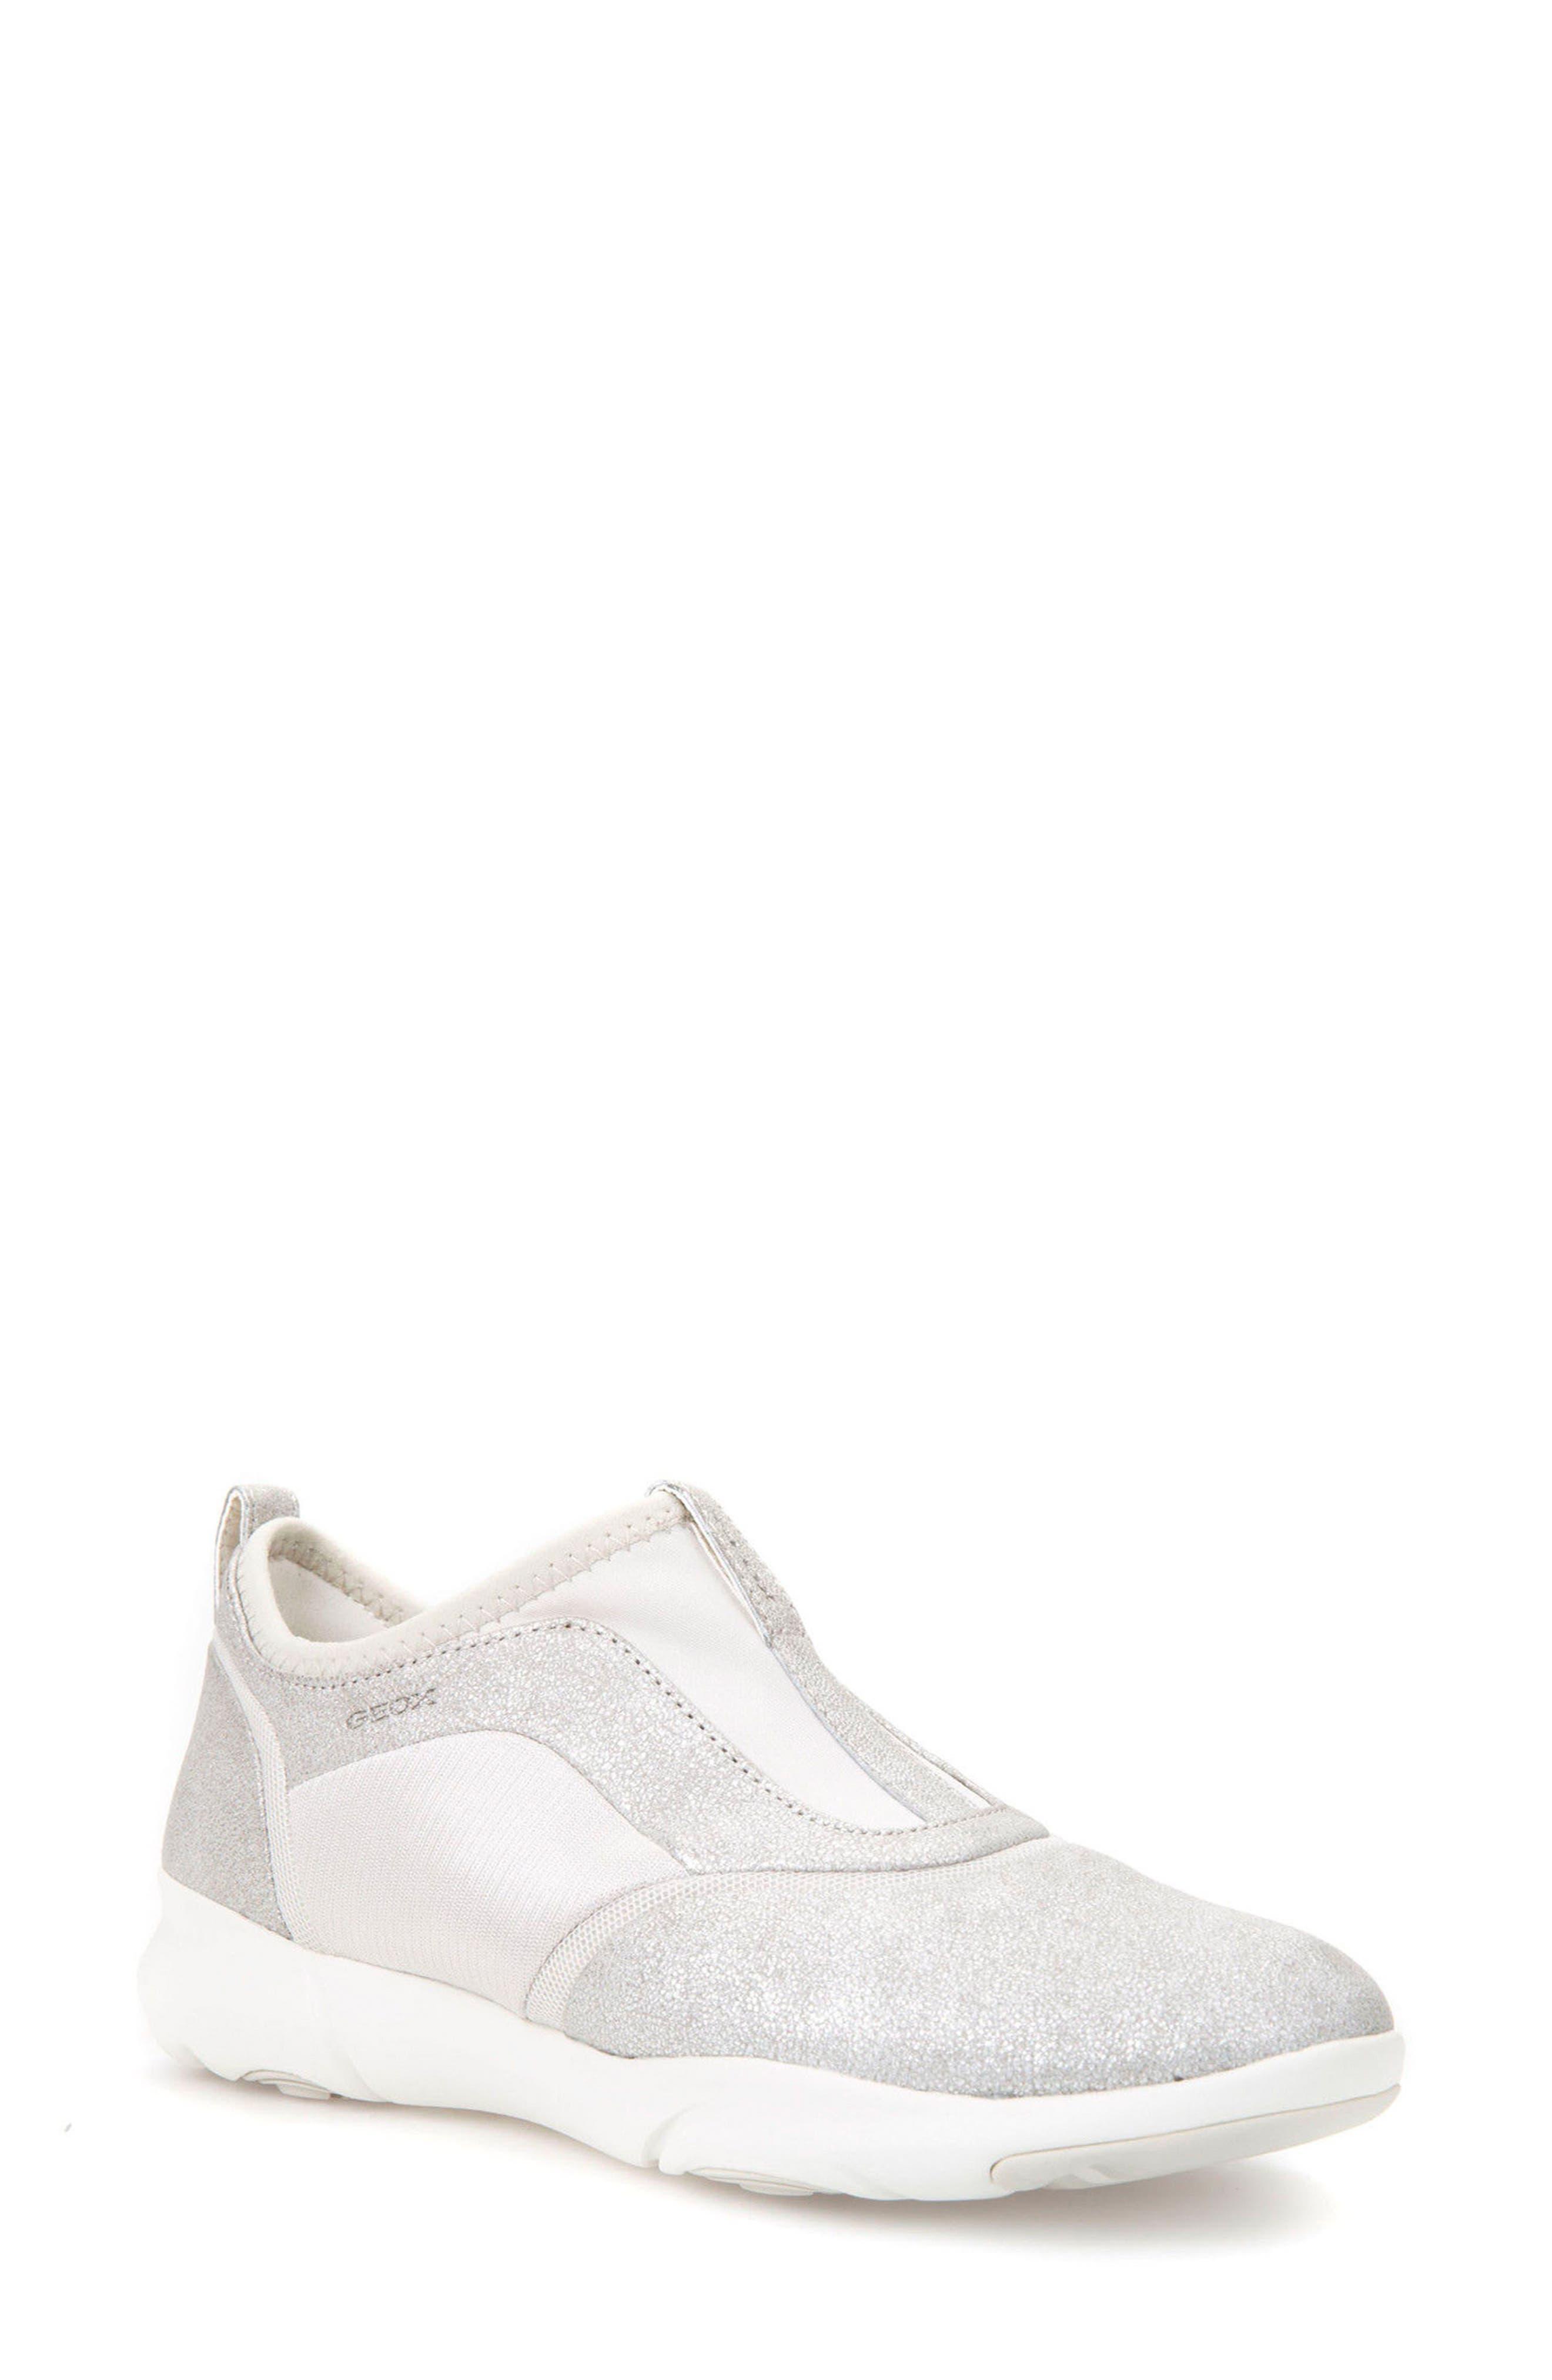 Nebula S Slip-On Sneaker,                         Main,                         color, SILVER LEATHER